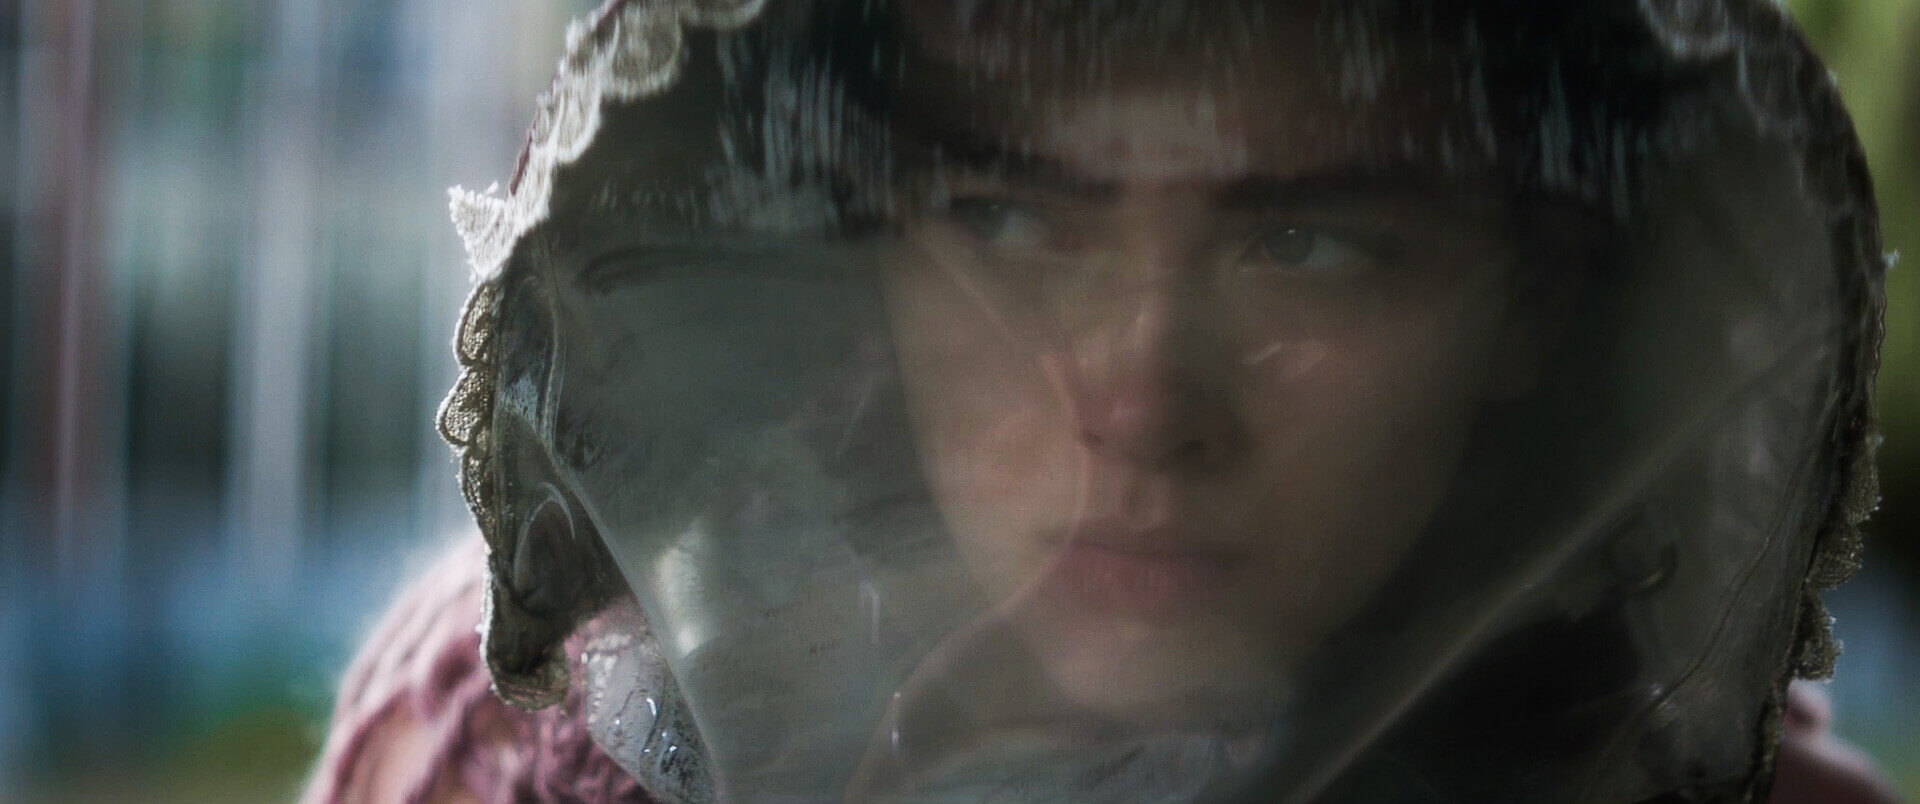 Film still from Glasshouse (2021)